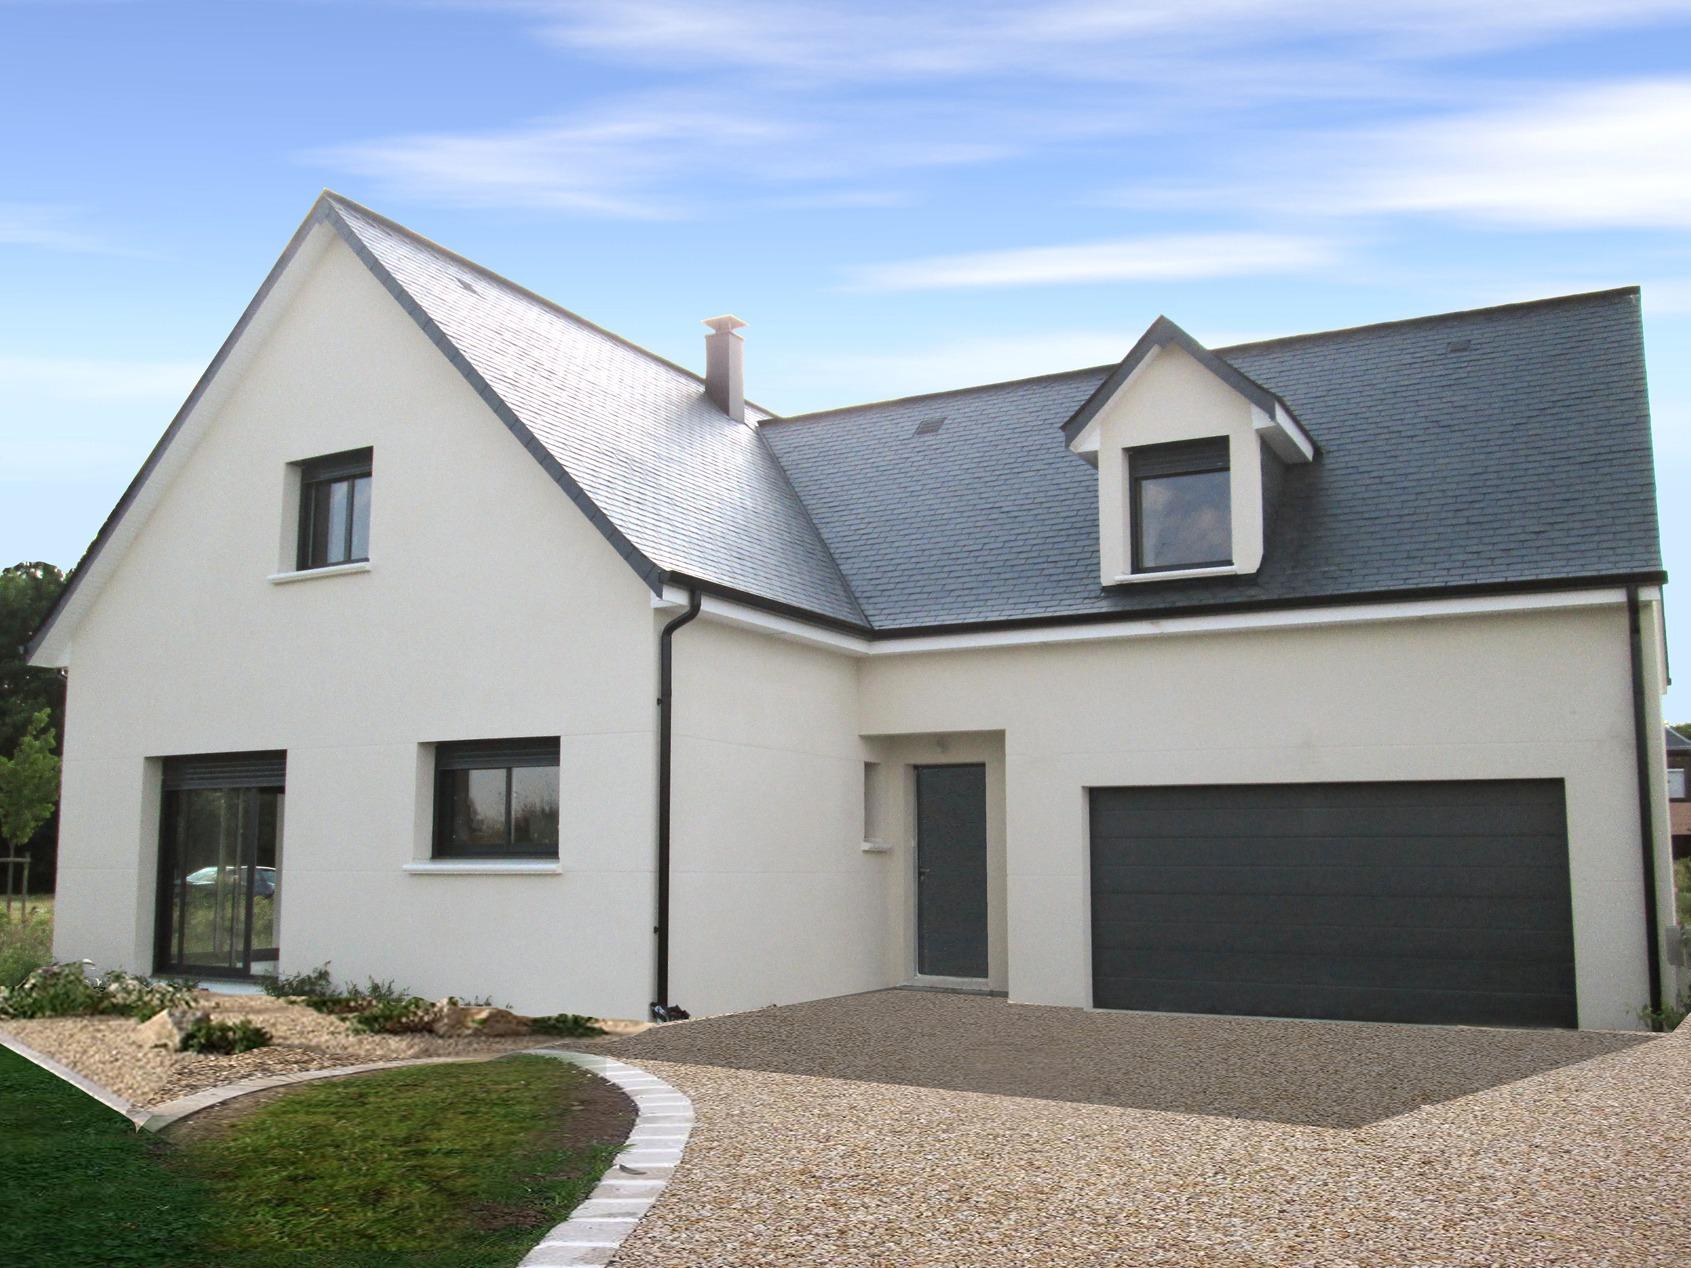 Maisons + Terrains du constructeur CASTOR MESNIL ESNARD • 130 m² • GRAND COURONNE